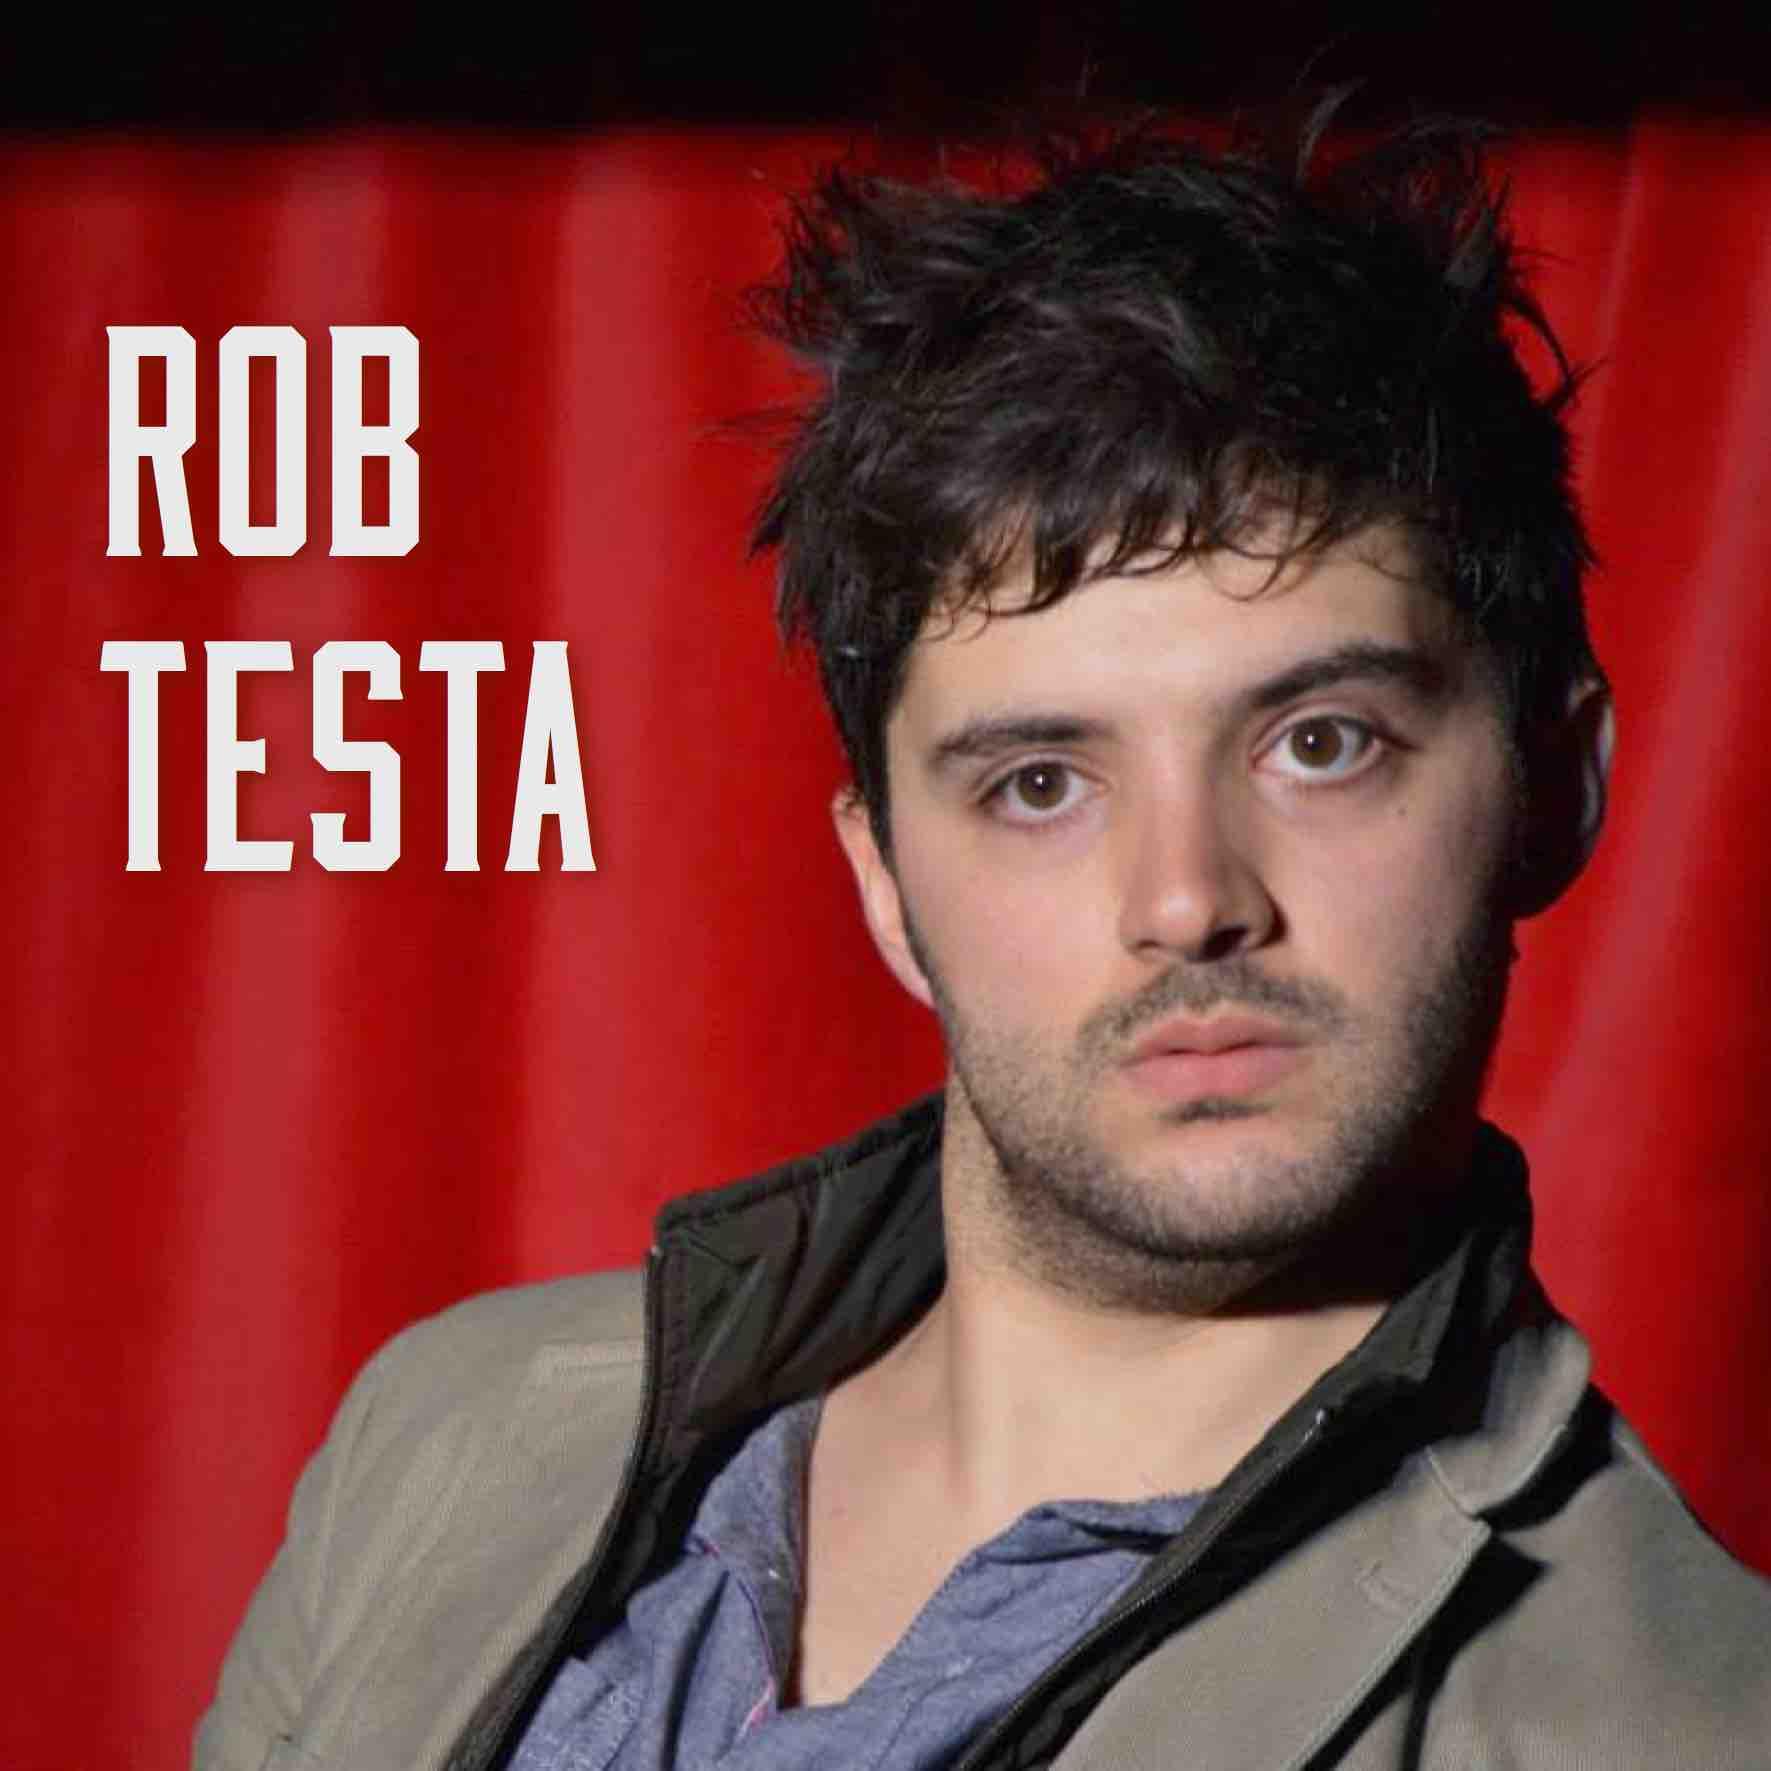 Testa-Rob.jpg